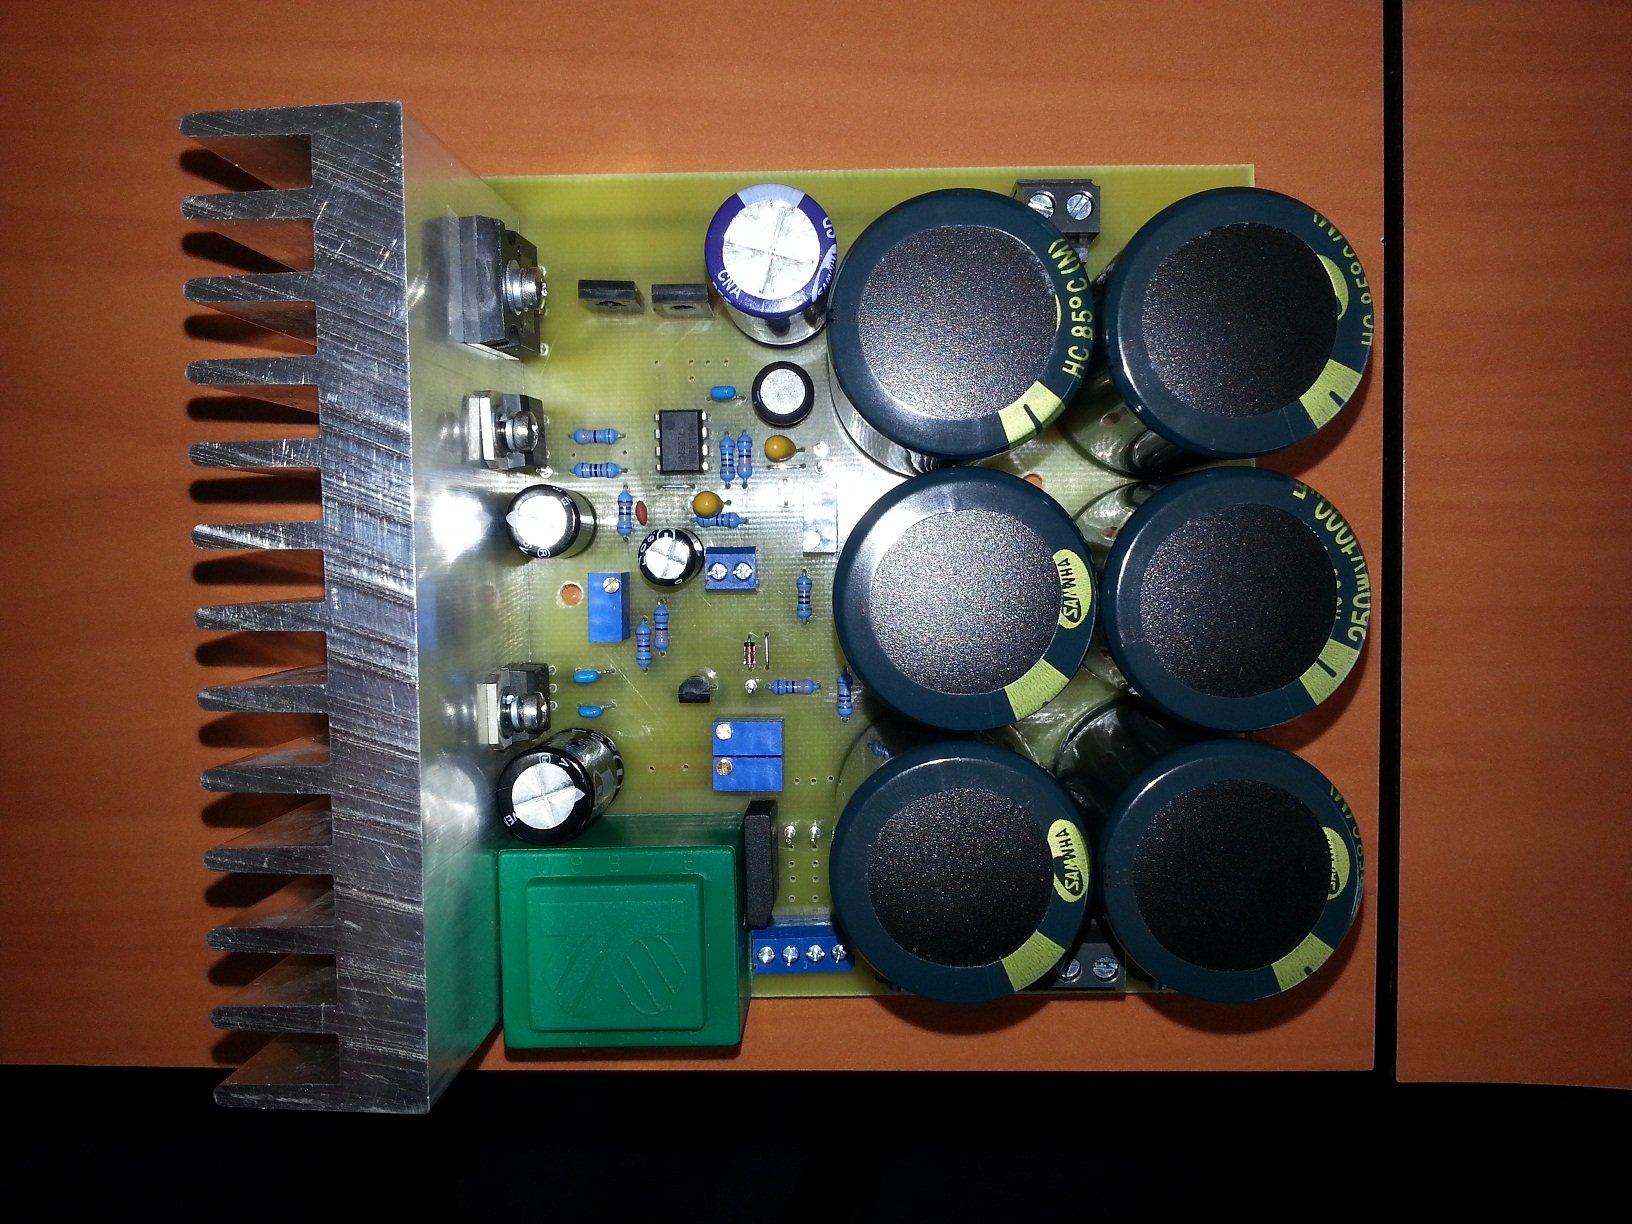 Automatick Regulace Boileru Diskuze Tzb Info Green Circuit Board Without Components Stock Photo C Jenmax Obrzek